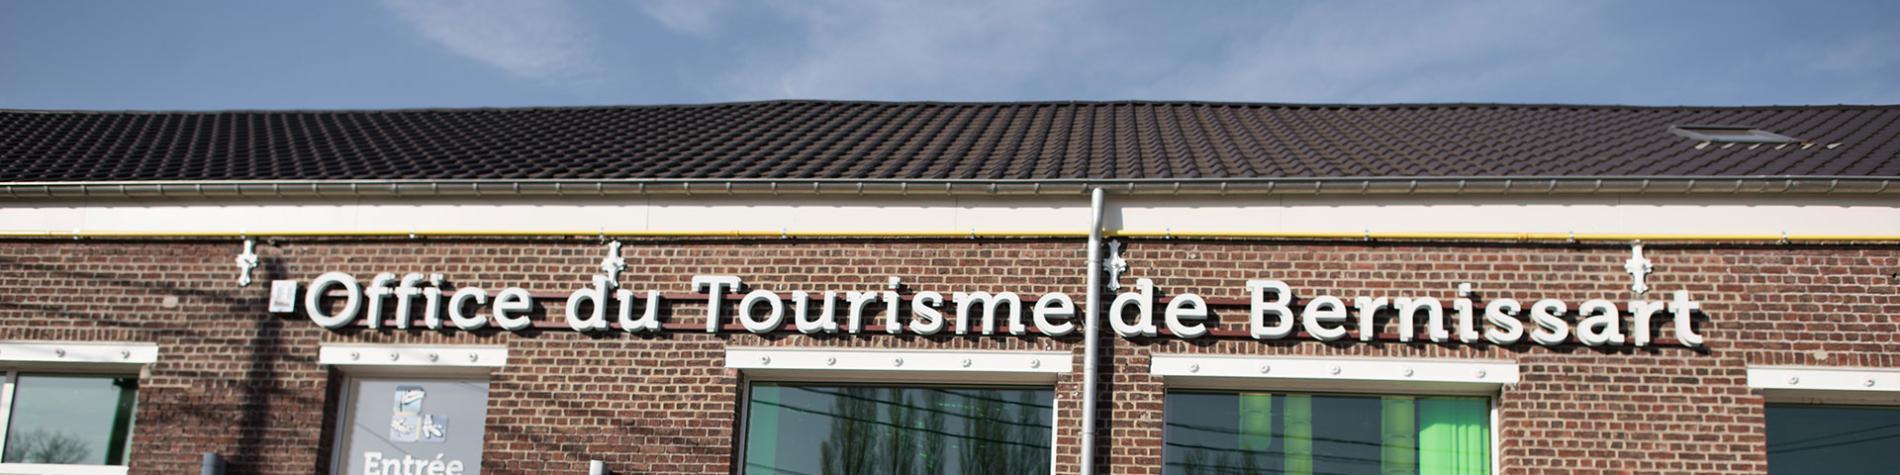 Office du Tourisme de Bernissart - RANDO - velo - location de vélo